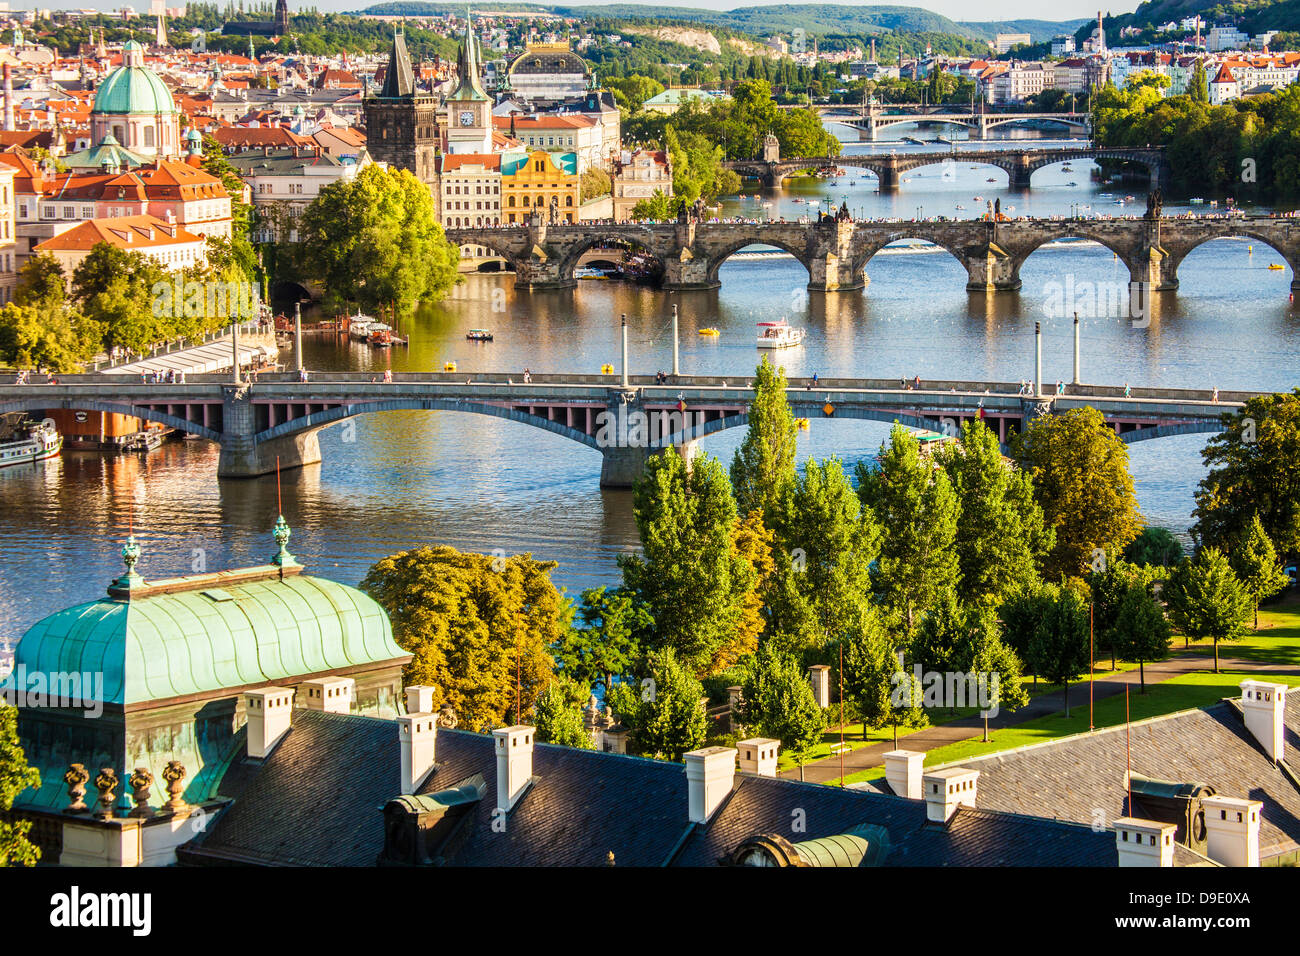 View of Prague and bridges over river Vltava (Moldau) Czech Republic. Famous Charles Bridge is second from bottom. - Stock Image